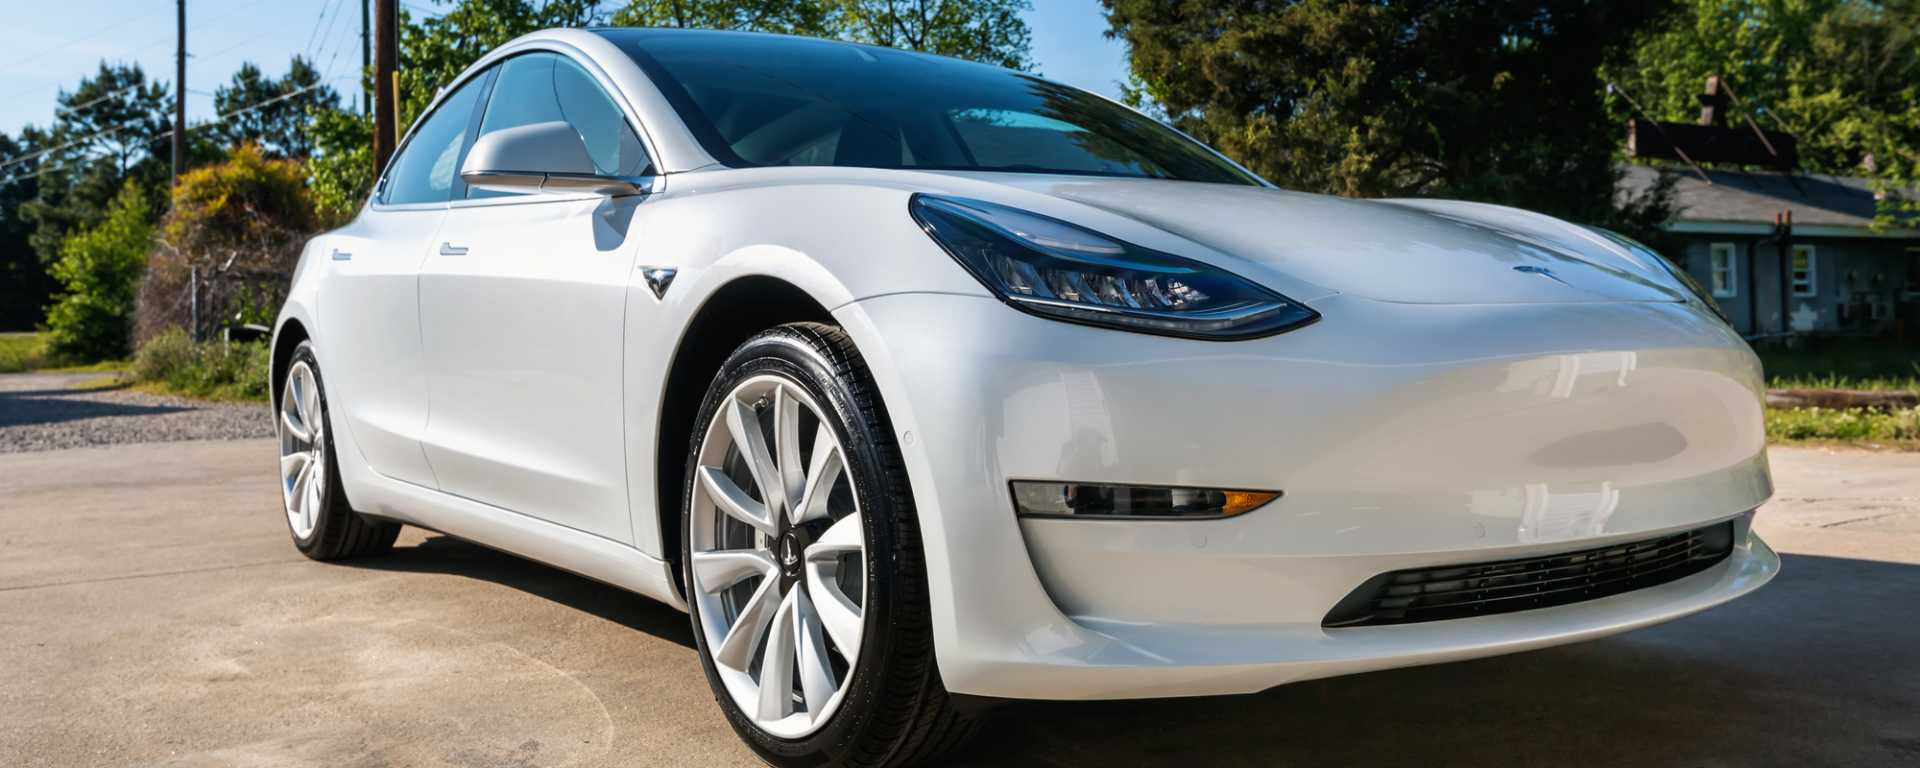 A brand new white Tesla Model 3 - image courtesy of Depositphotos.